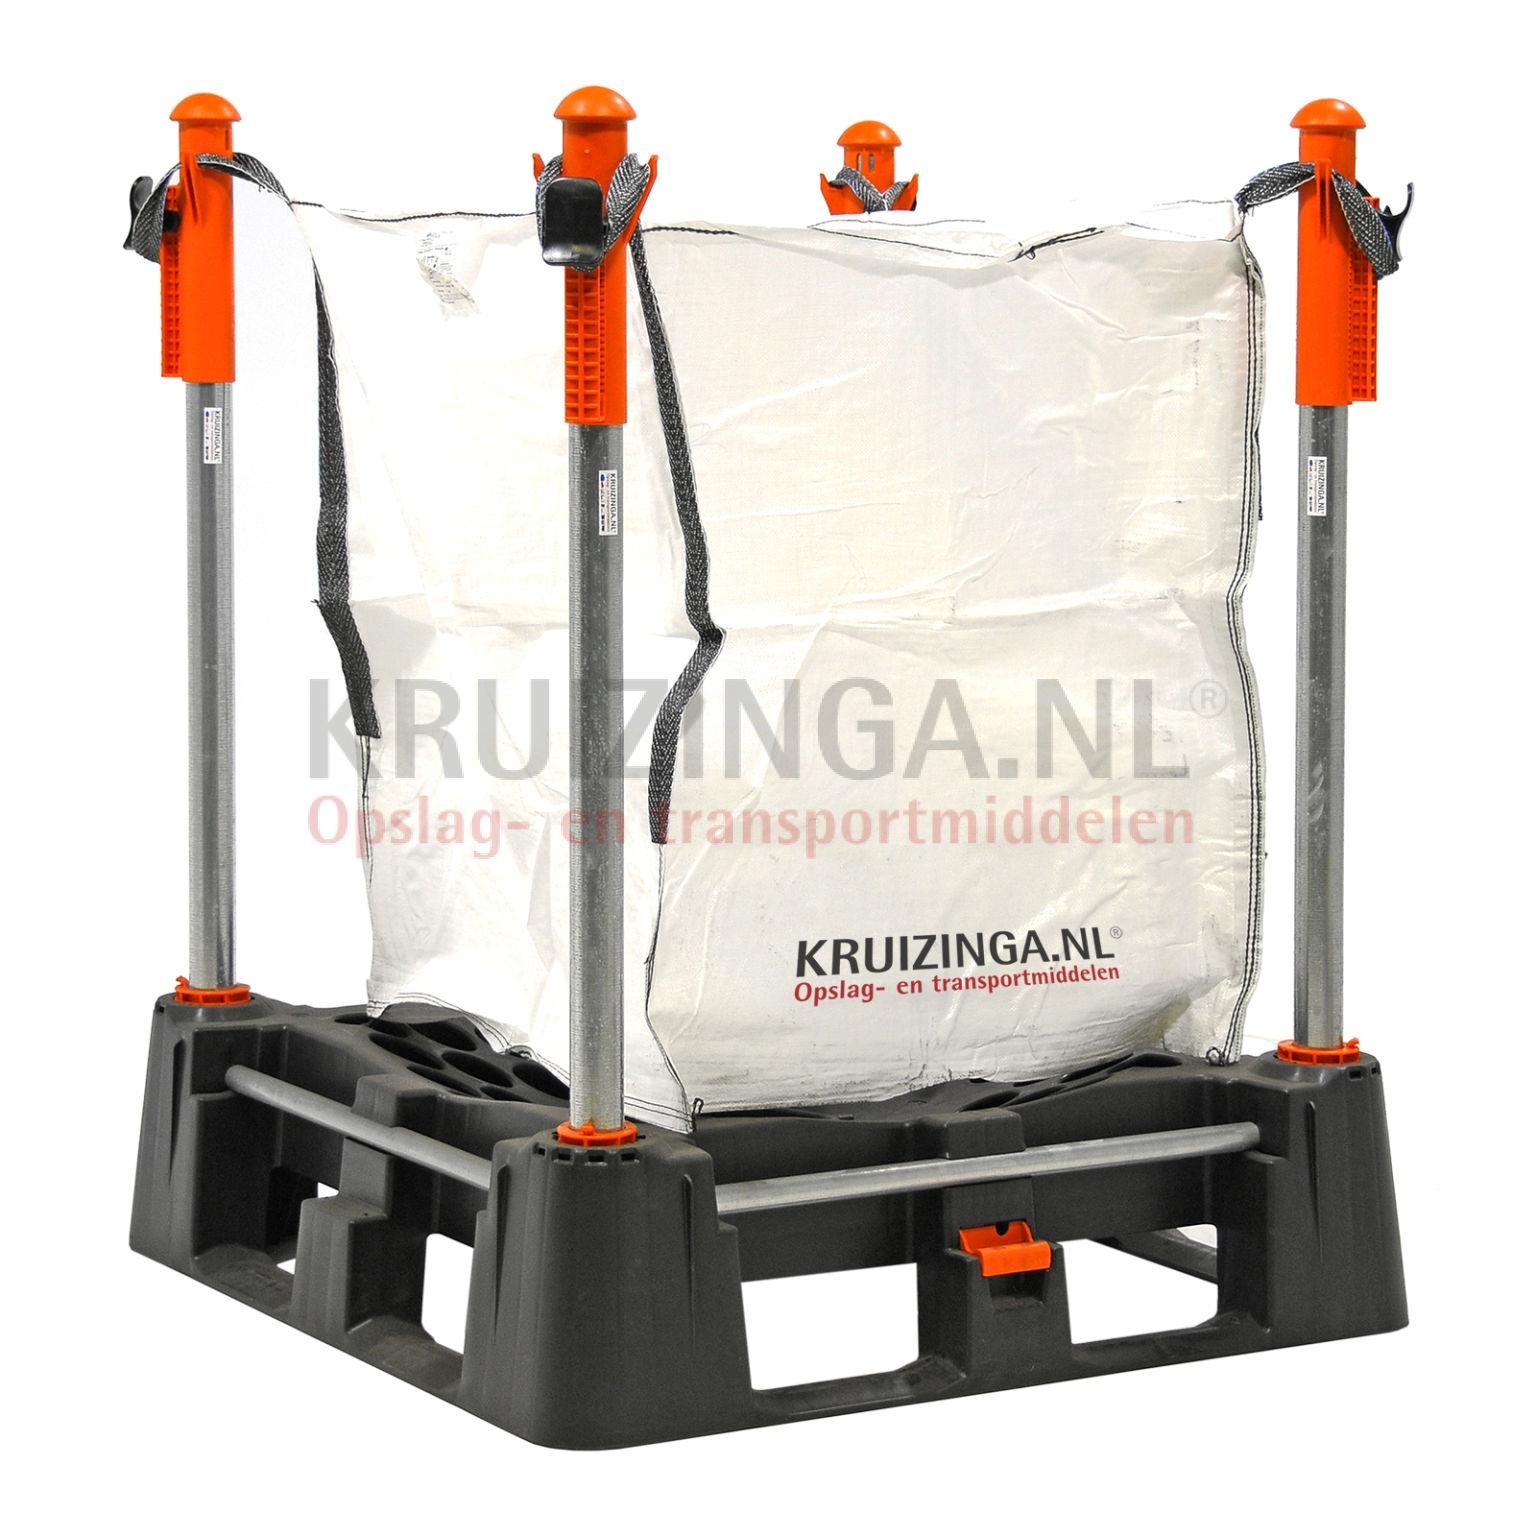 big bag rack big bag rack met onderlosmogelijkheid vanaf 330 75 incl levering. Black Bedroom Furniture Sets. Home Design Ideas